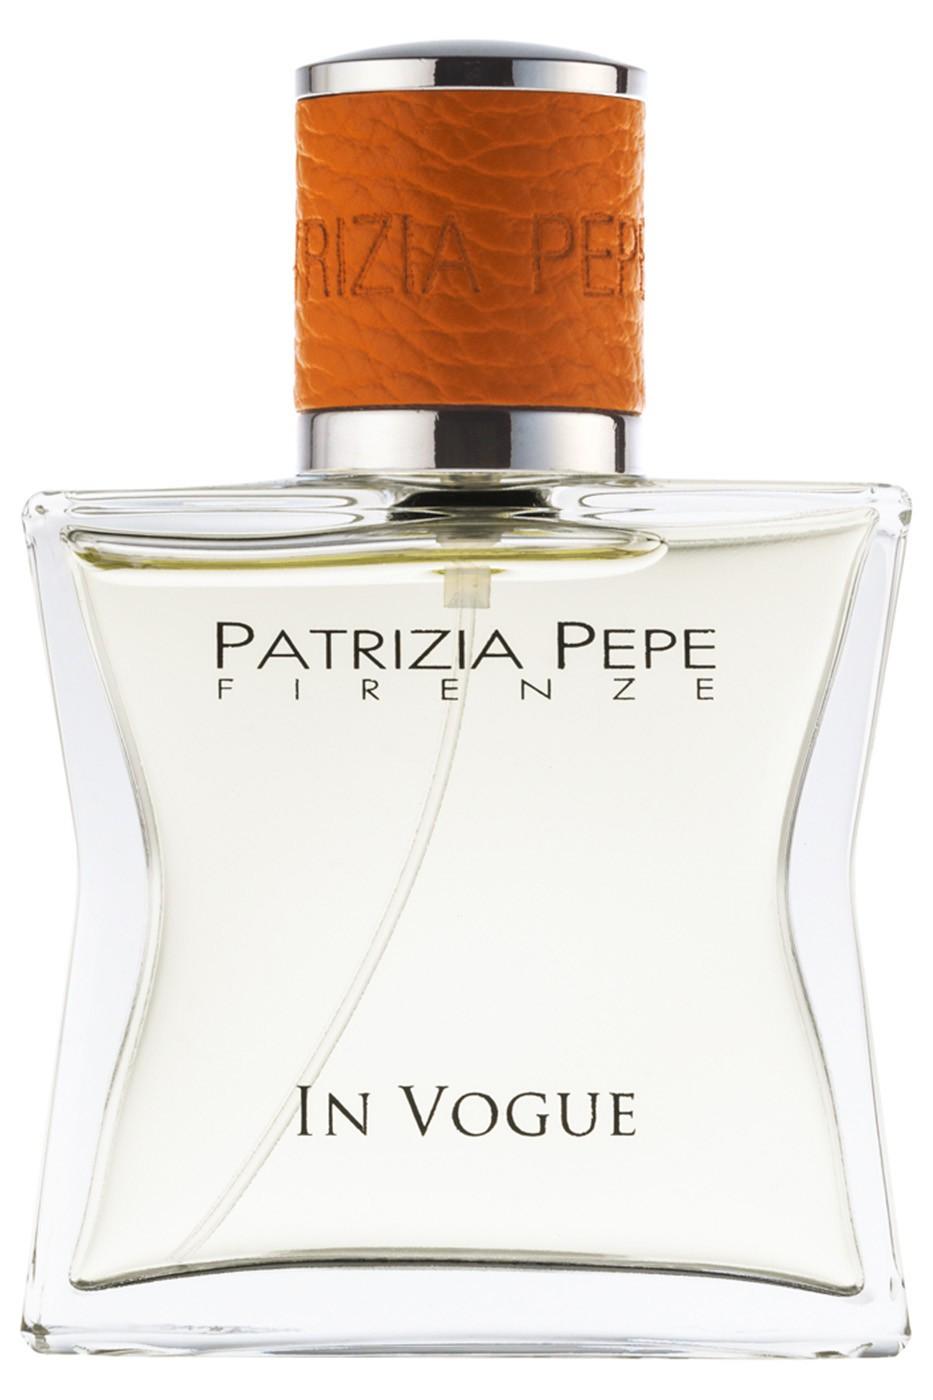 Patrizia Pepe In Vogue аромат для женщин